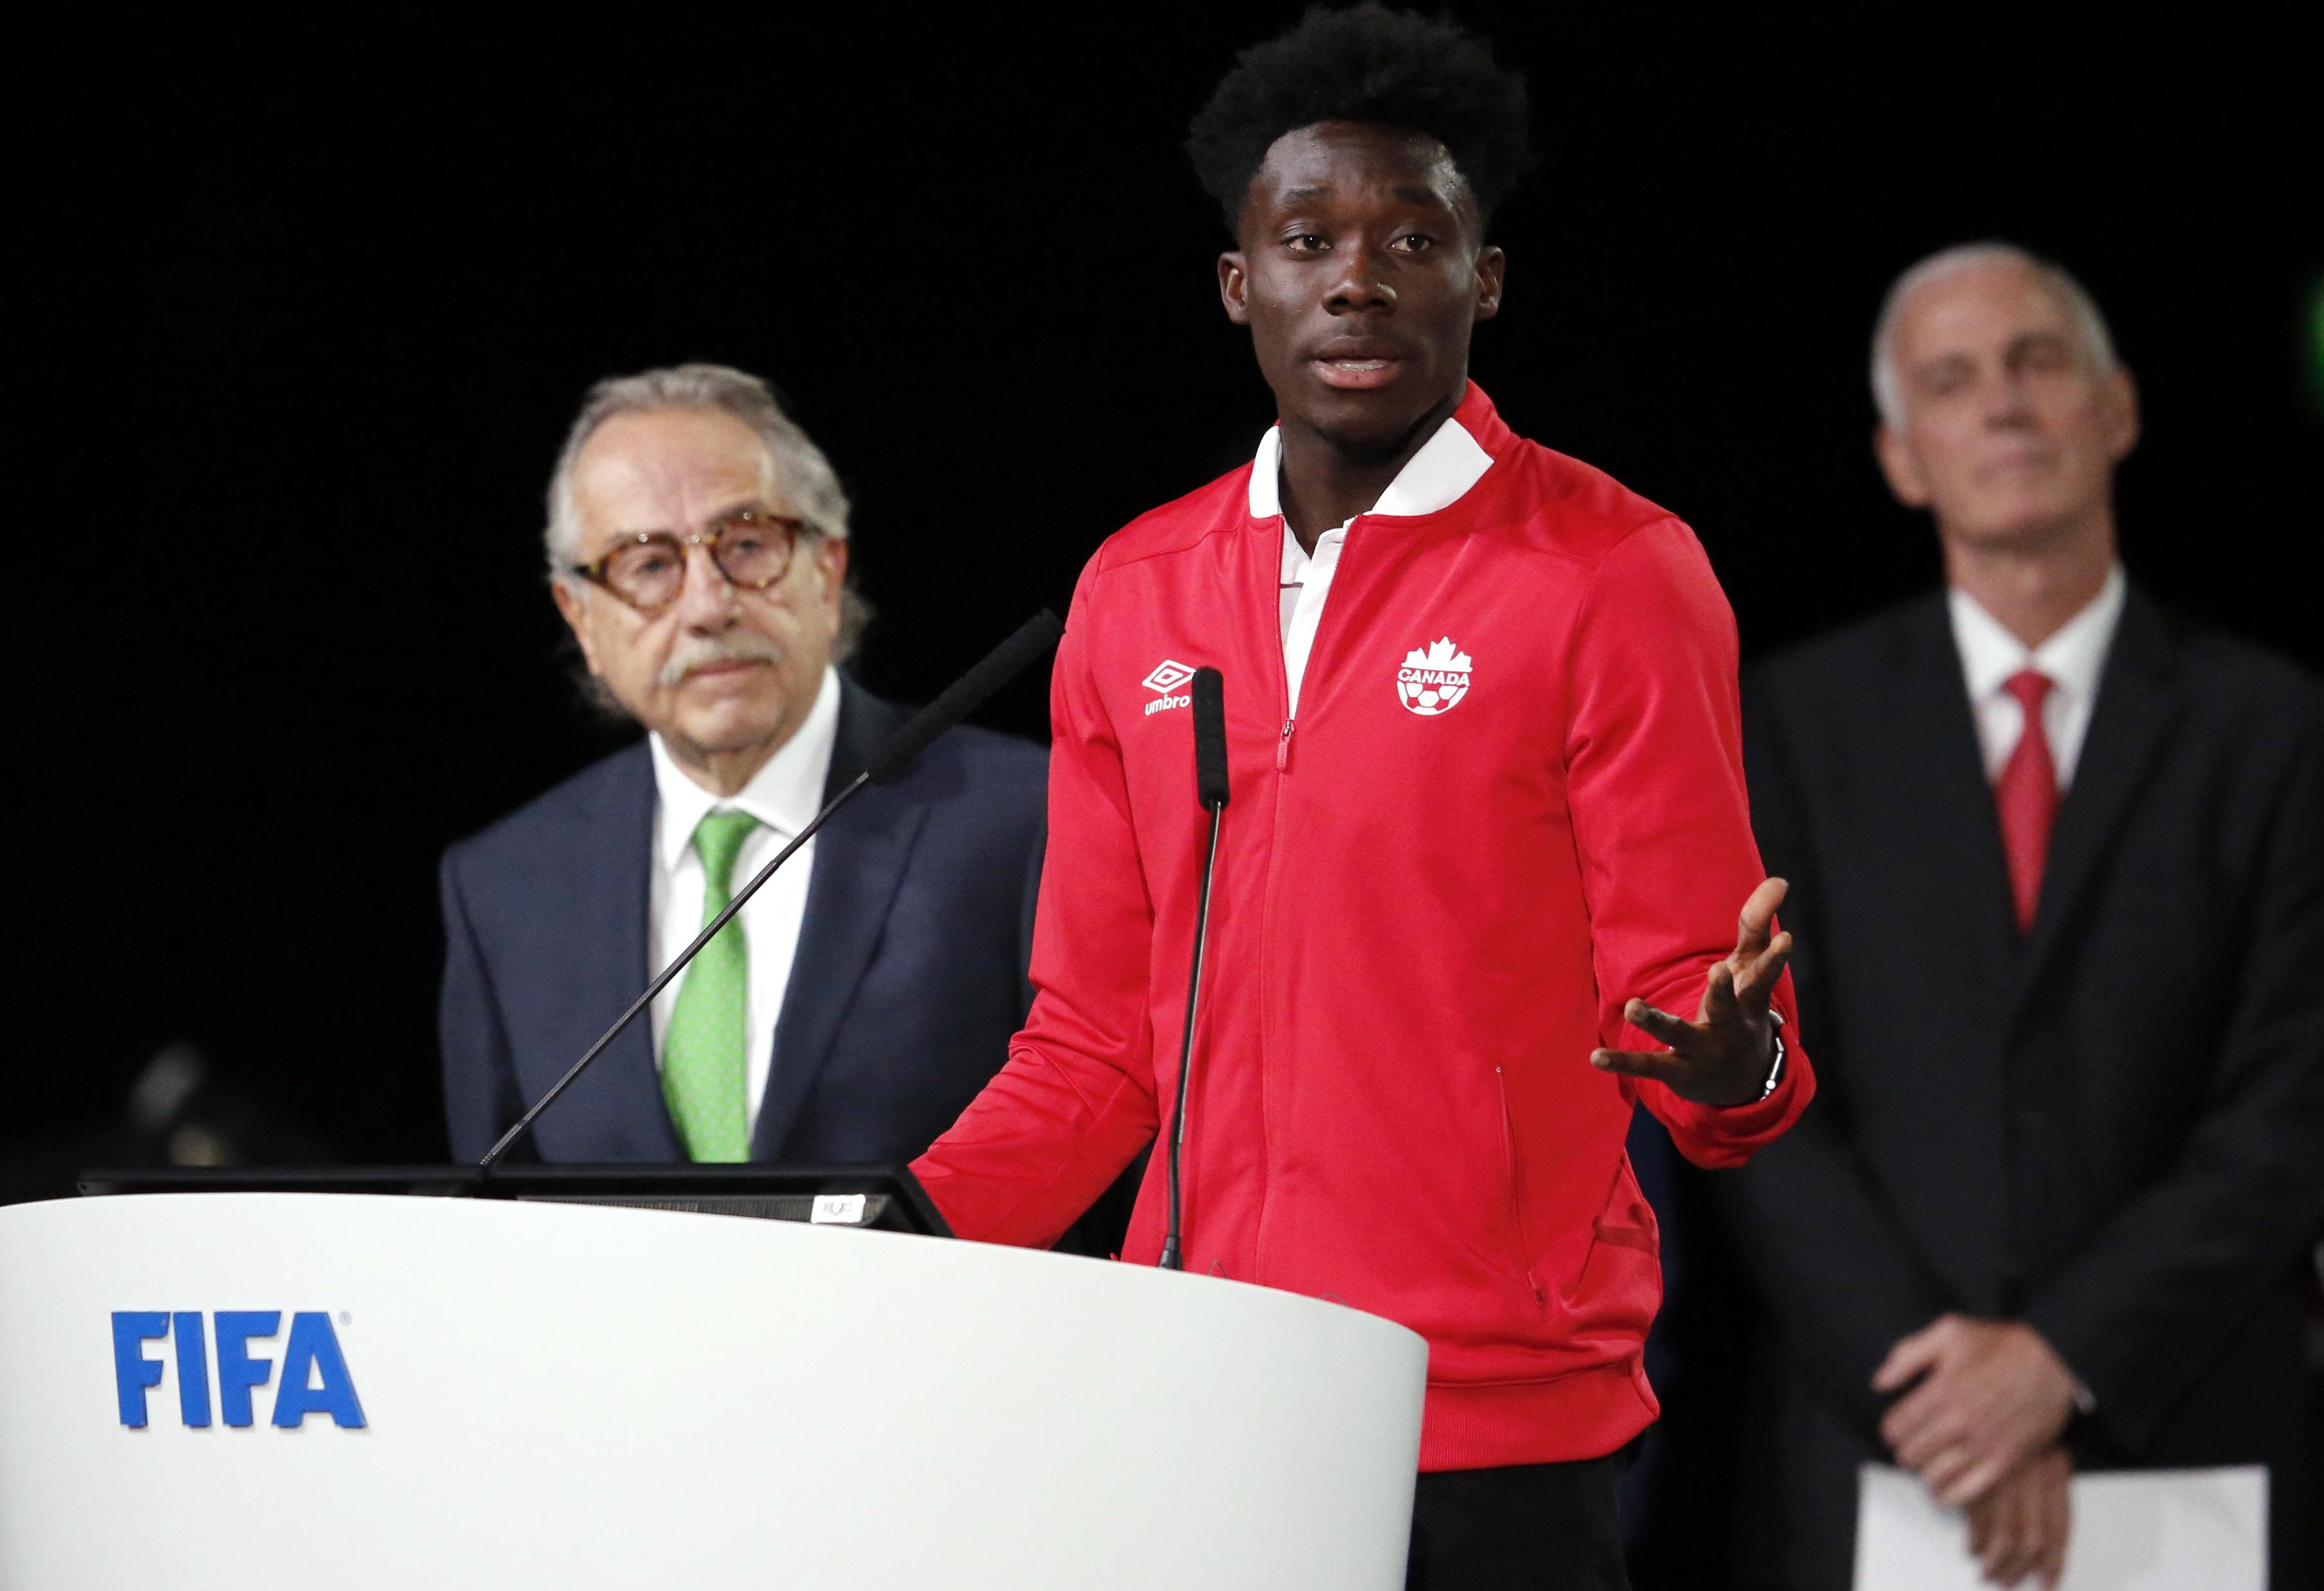 Starring role beckons for Alphonso Davies at Bayern Munich